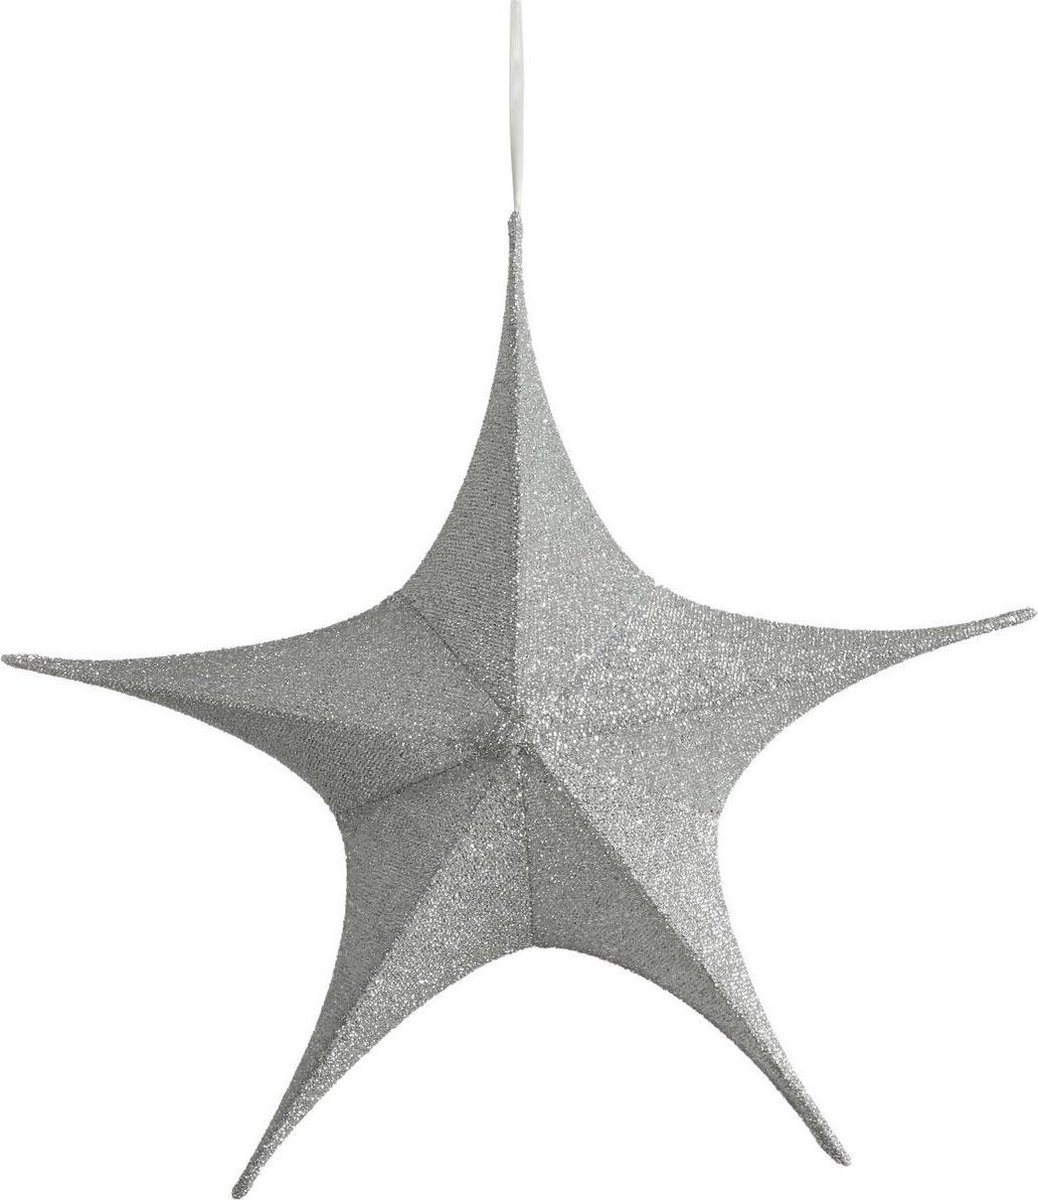 2 stuks House of seasons Ster zilver kleur D65cm kopen